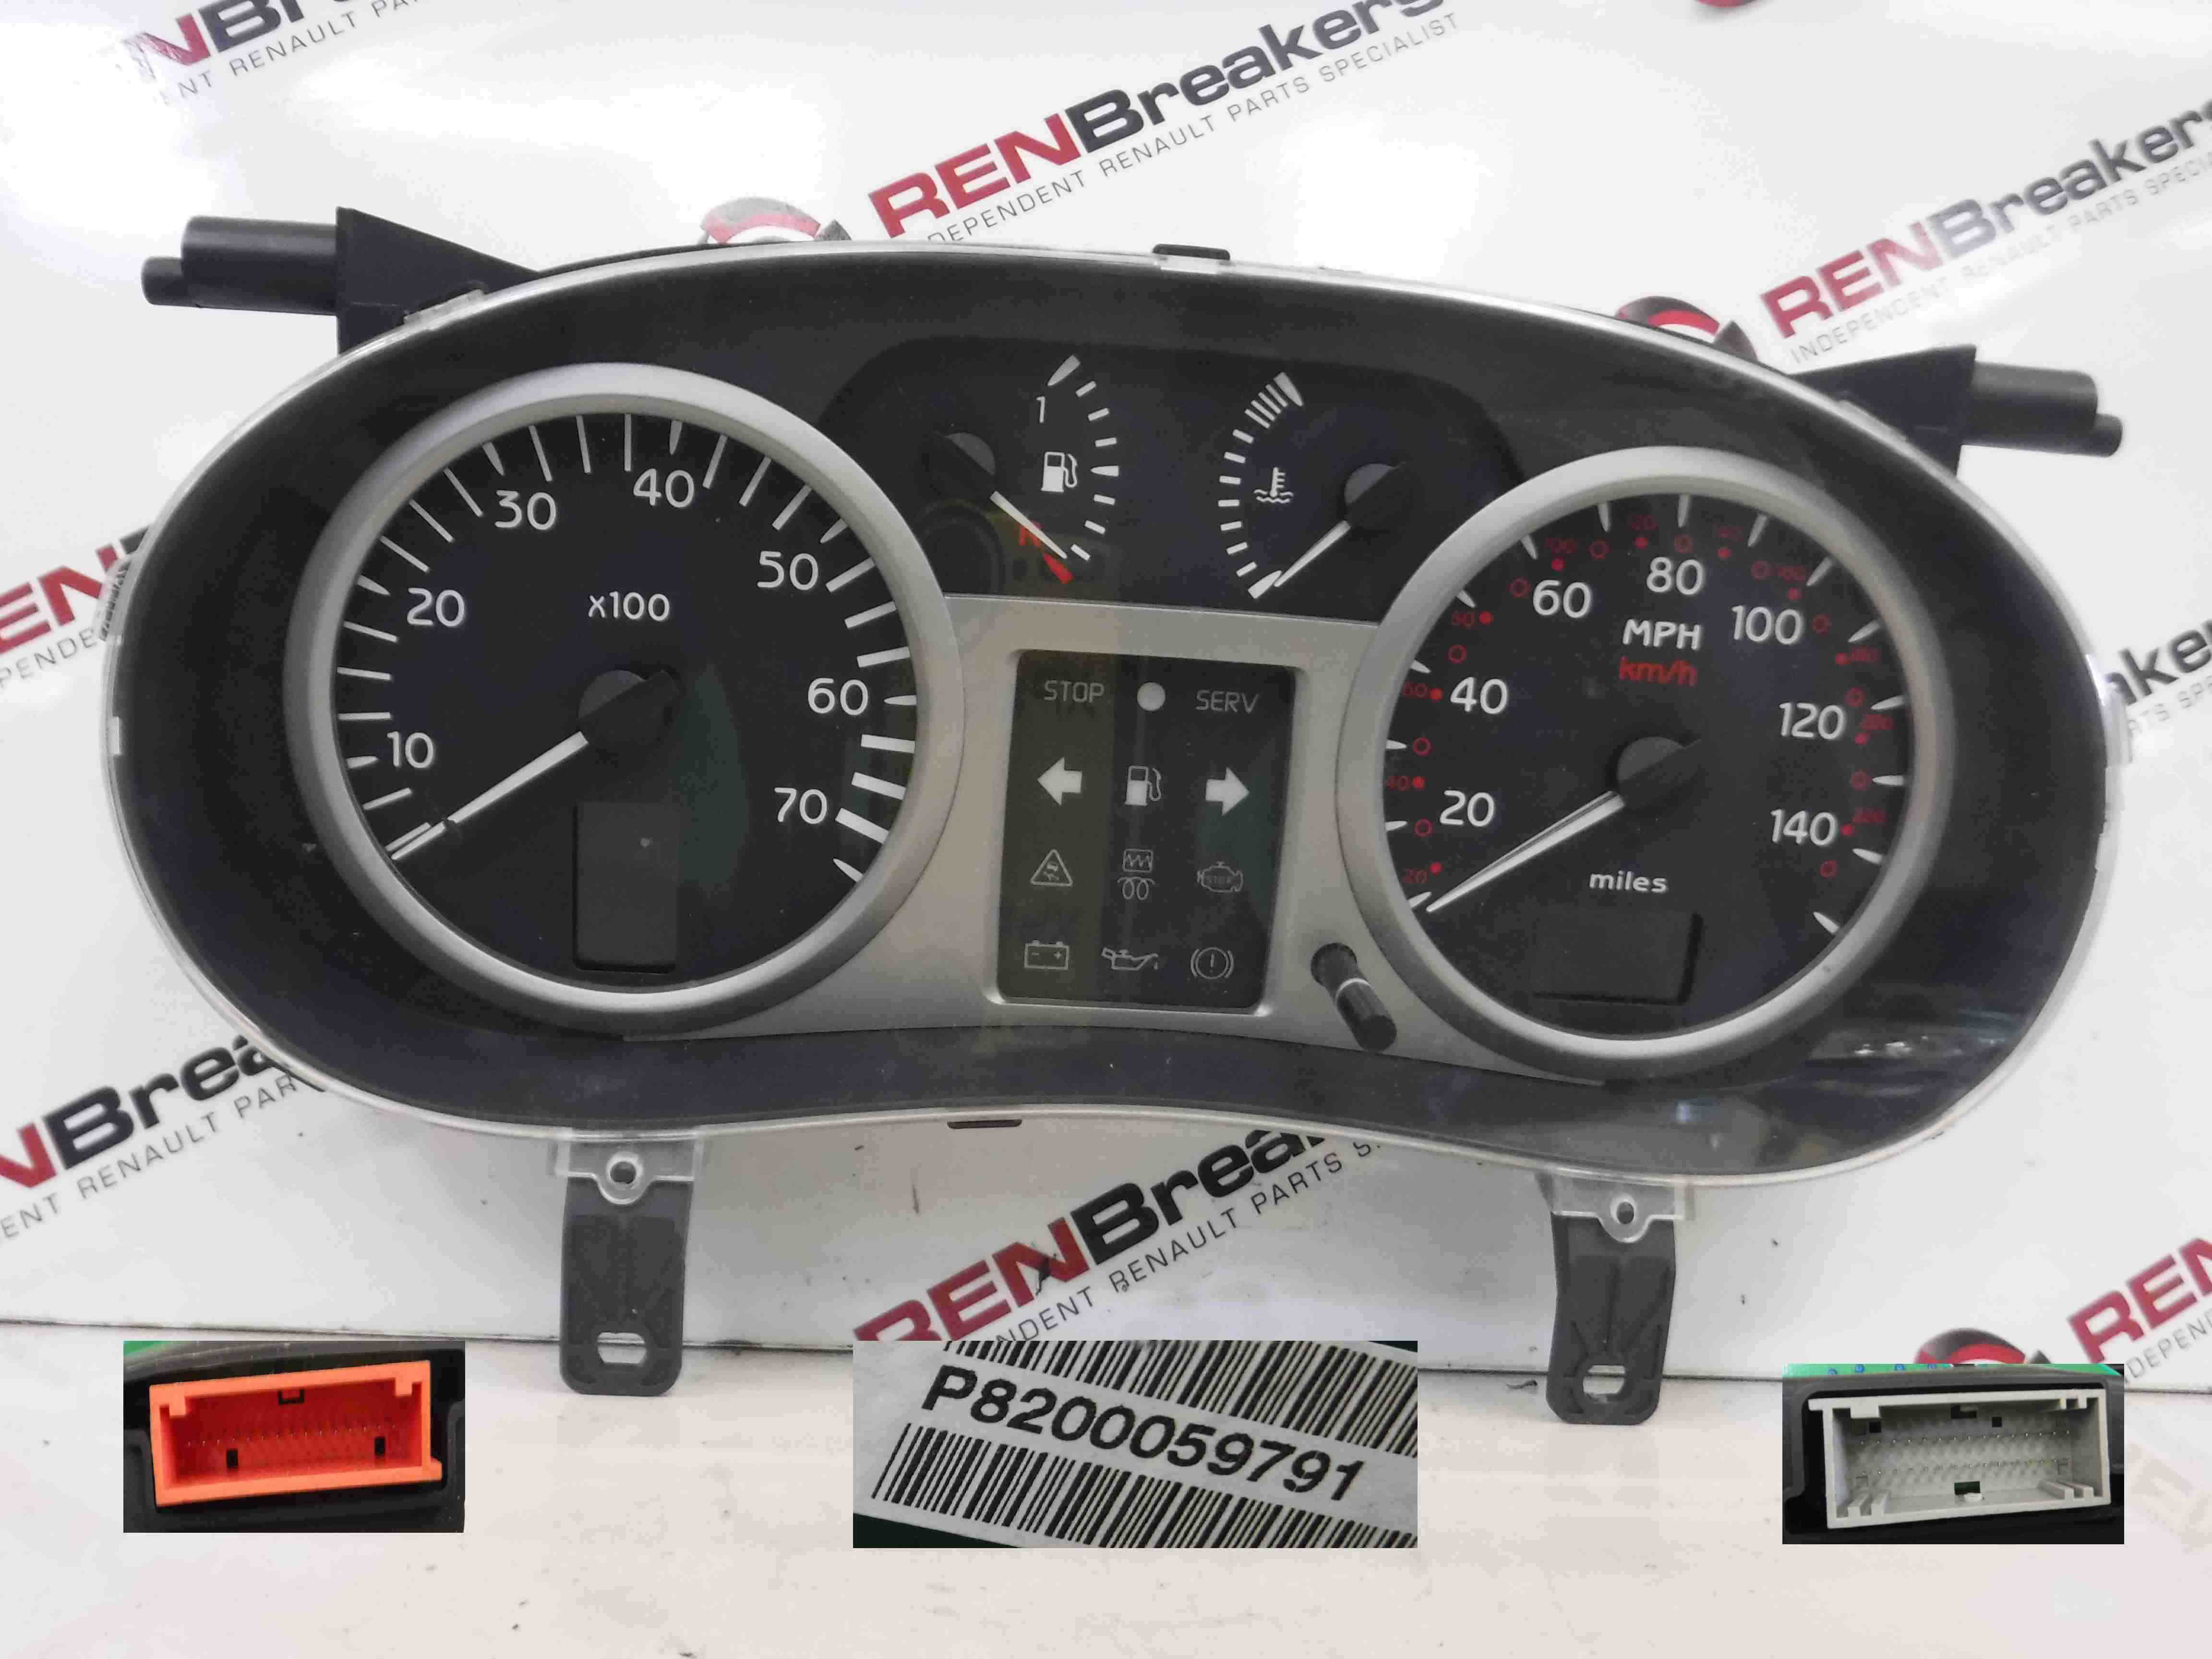 Renault Clio MK2 2001-2006 Instrument Panel Dials Gauges Clocks Automatic